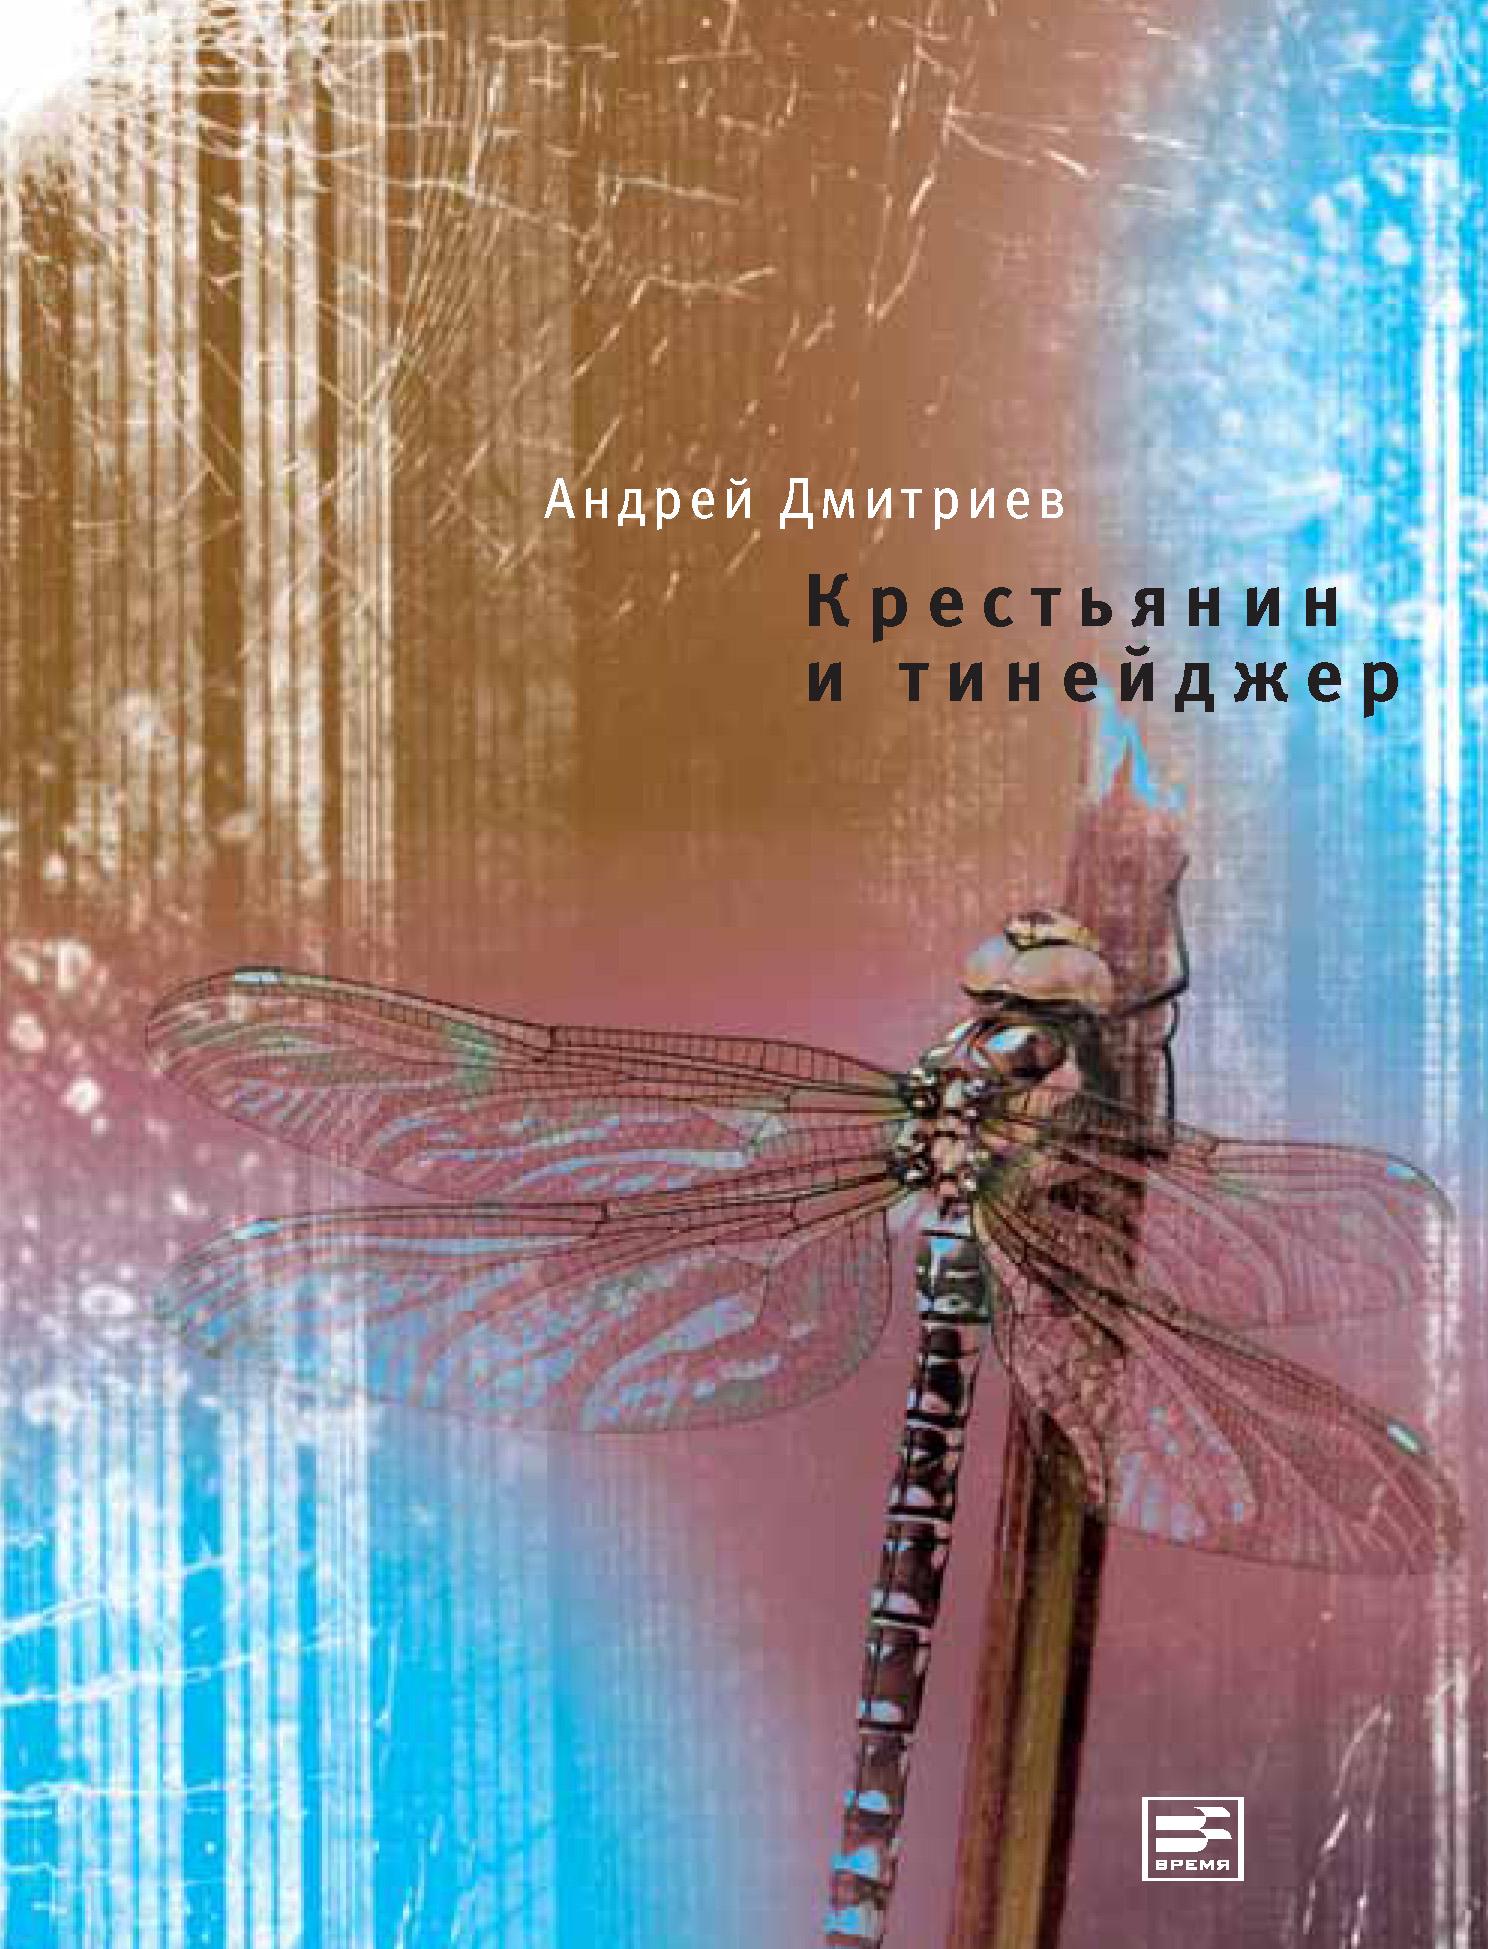 Андрей Дмитриев Крестьянин и тинейджер цена